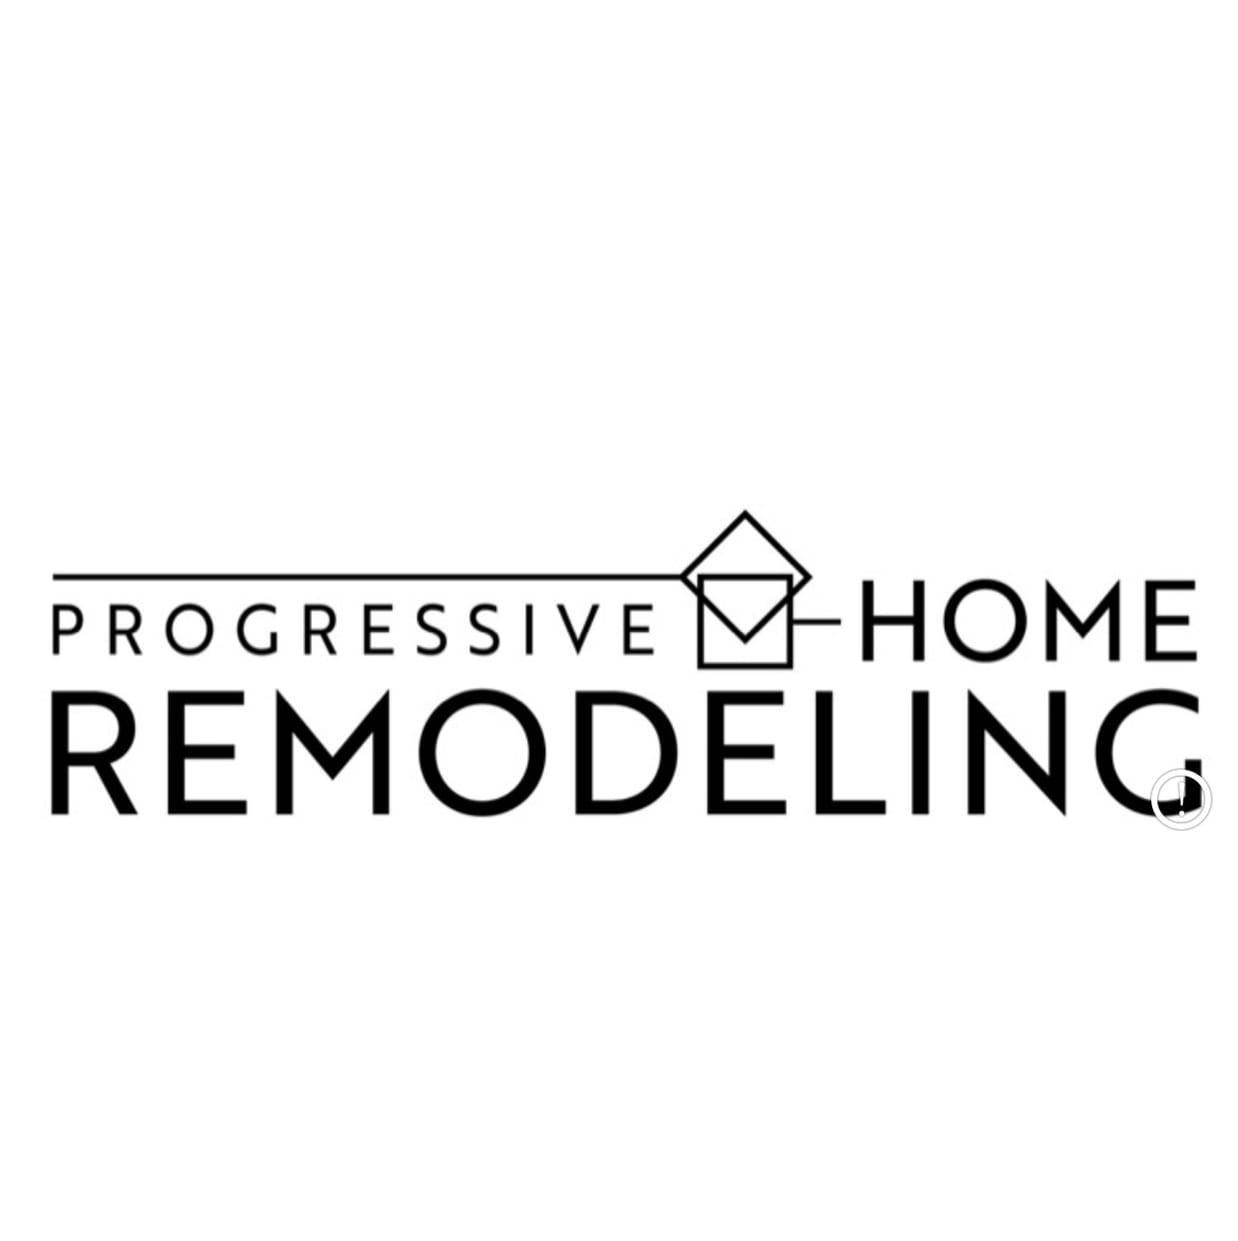 Progressive Home Remodeling logo